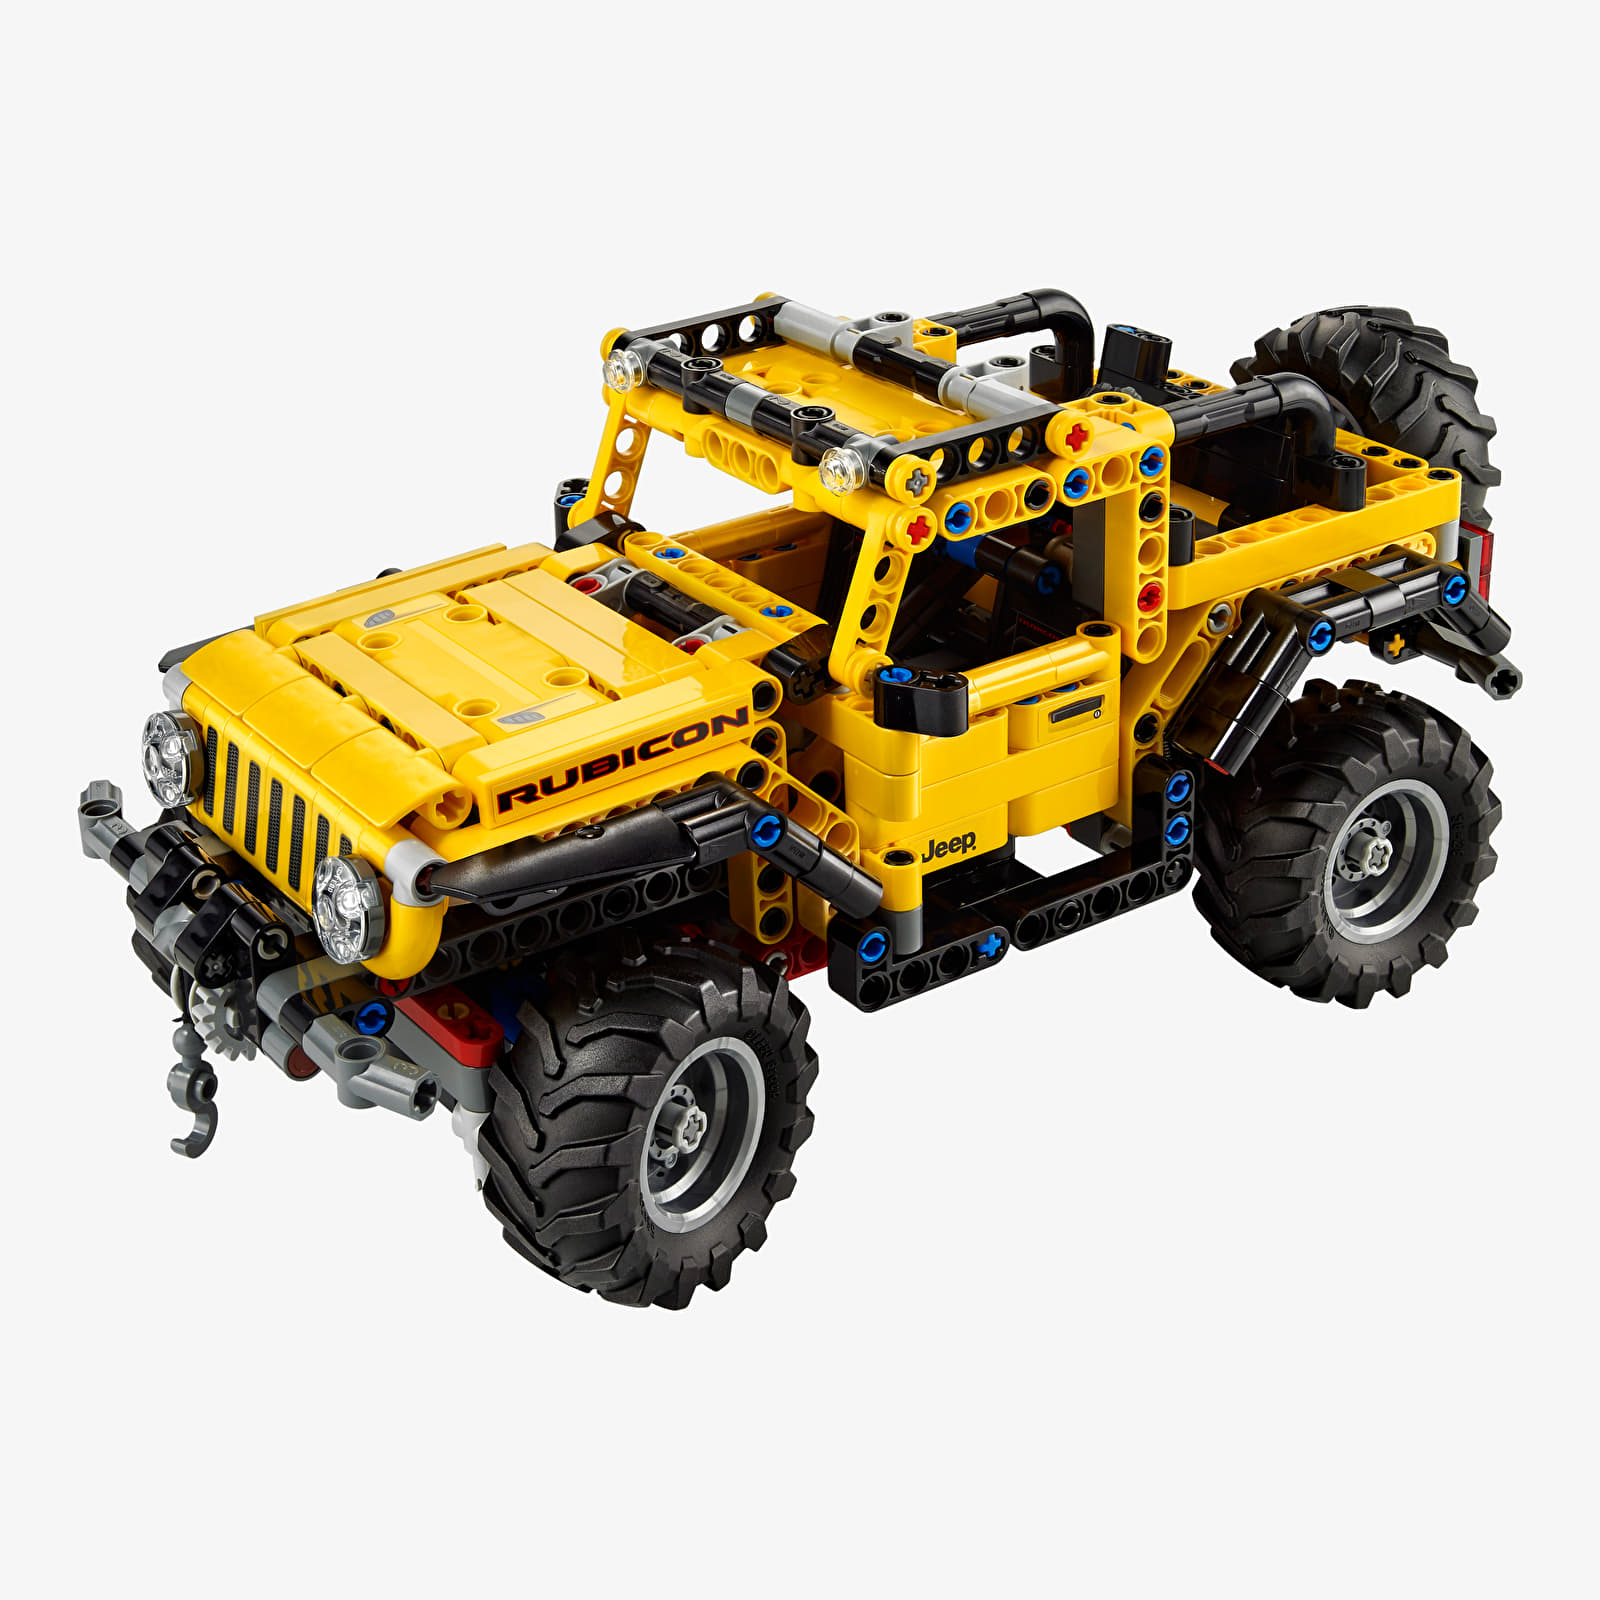 LEGO® Technic 42122 Jeep® Wrangler Universal